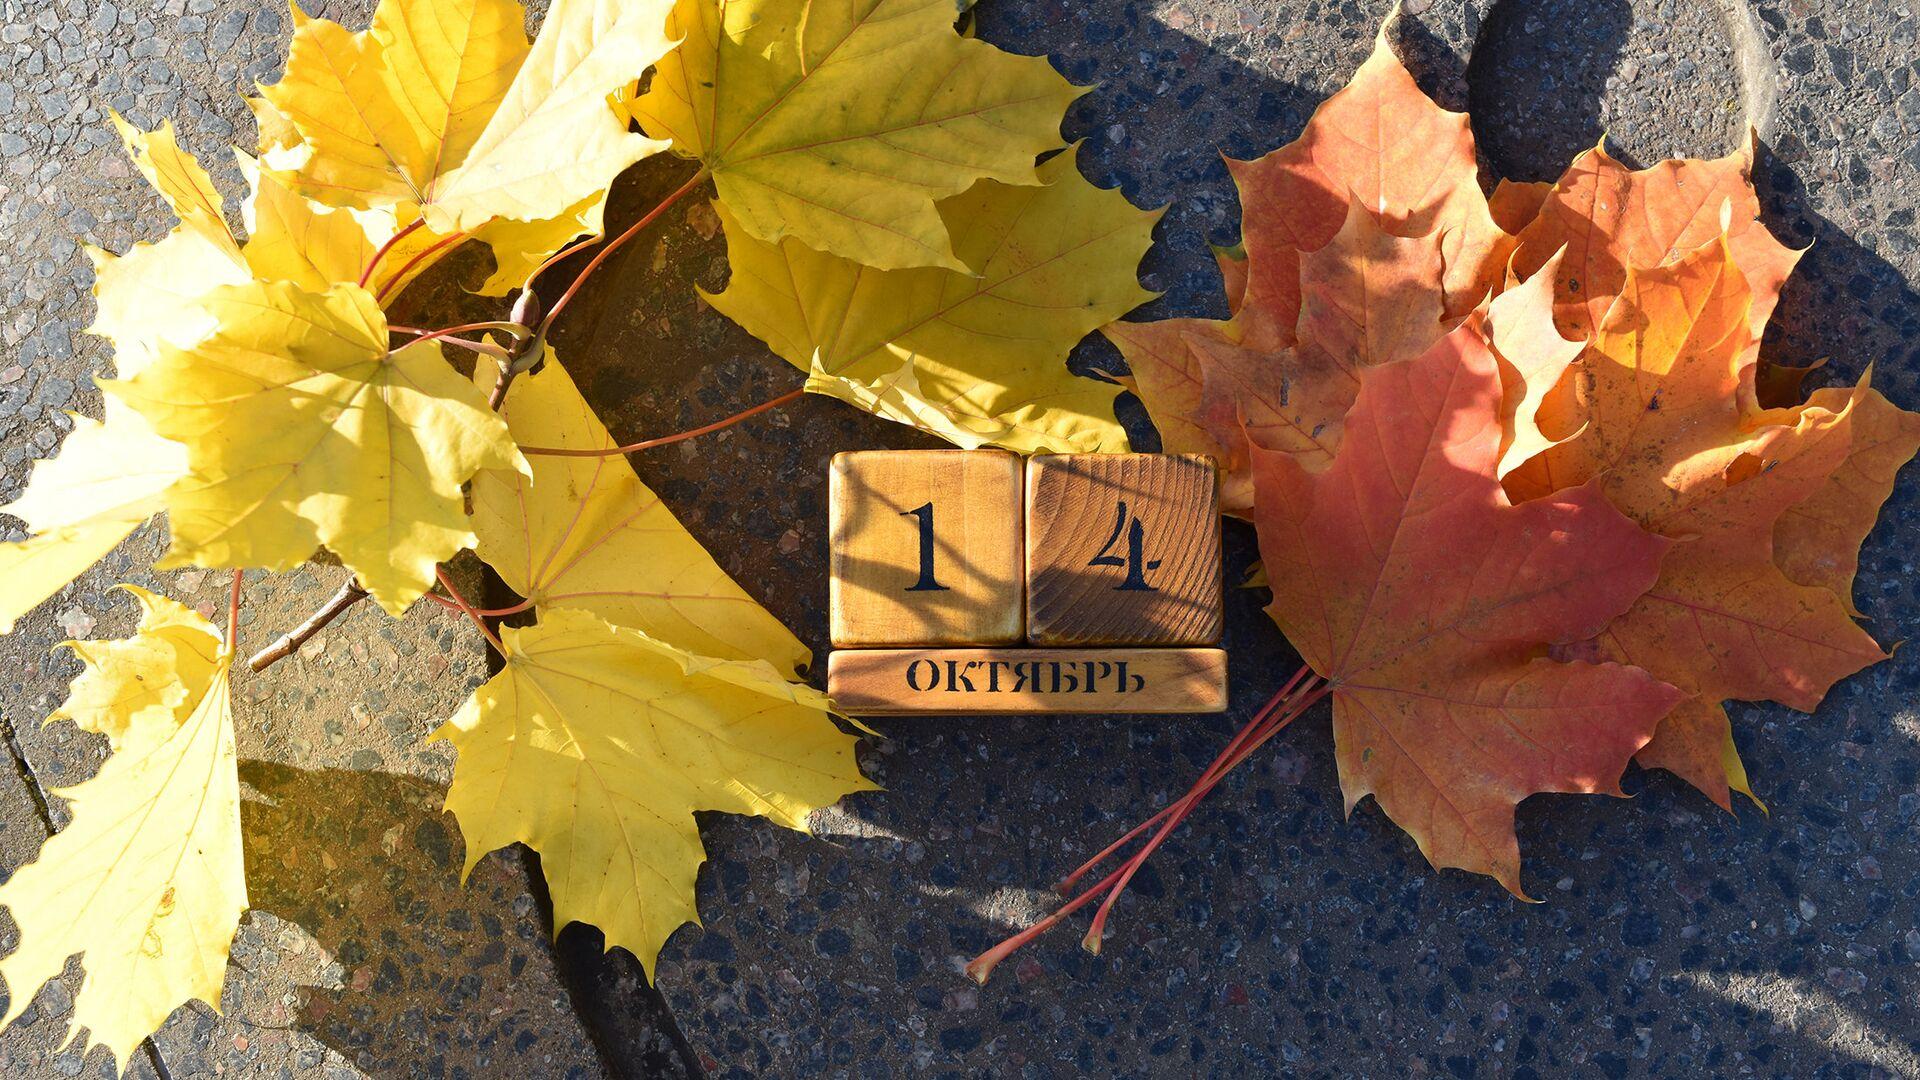 Календарь 14 октября - Sputnik Беларусь, 1920, 14.10.2021